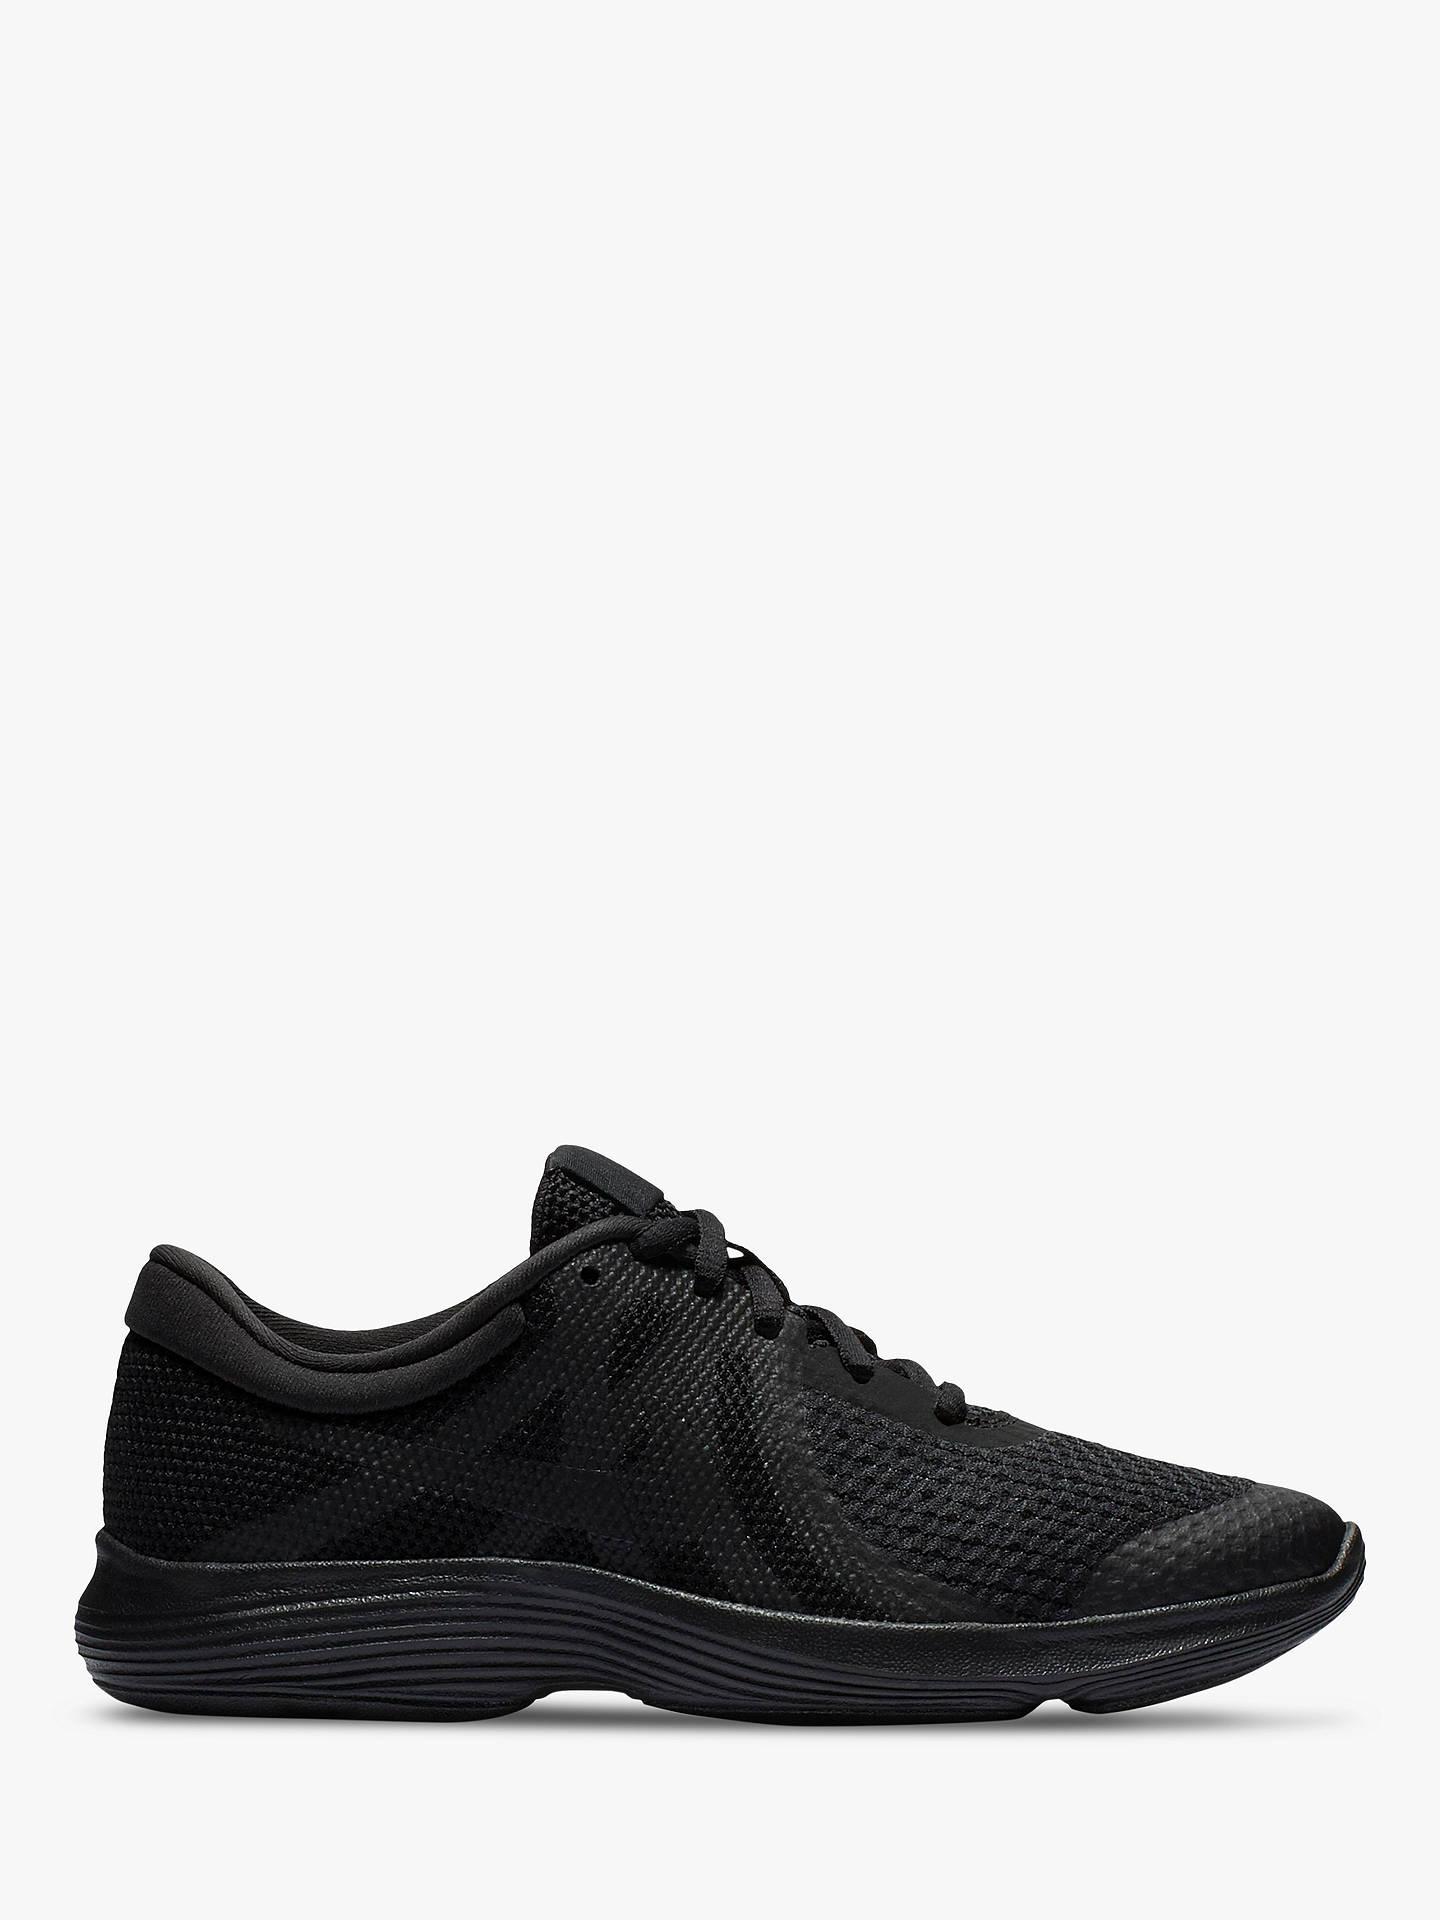 the latest 0e5d5 ea906 Buy Nike Children's Revolution 4 Trainers, Black, 3 Online at johnlewis. ...